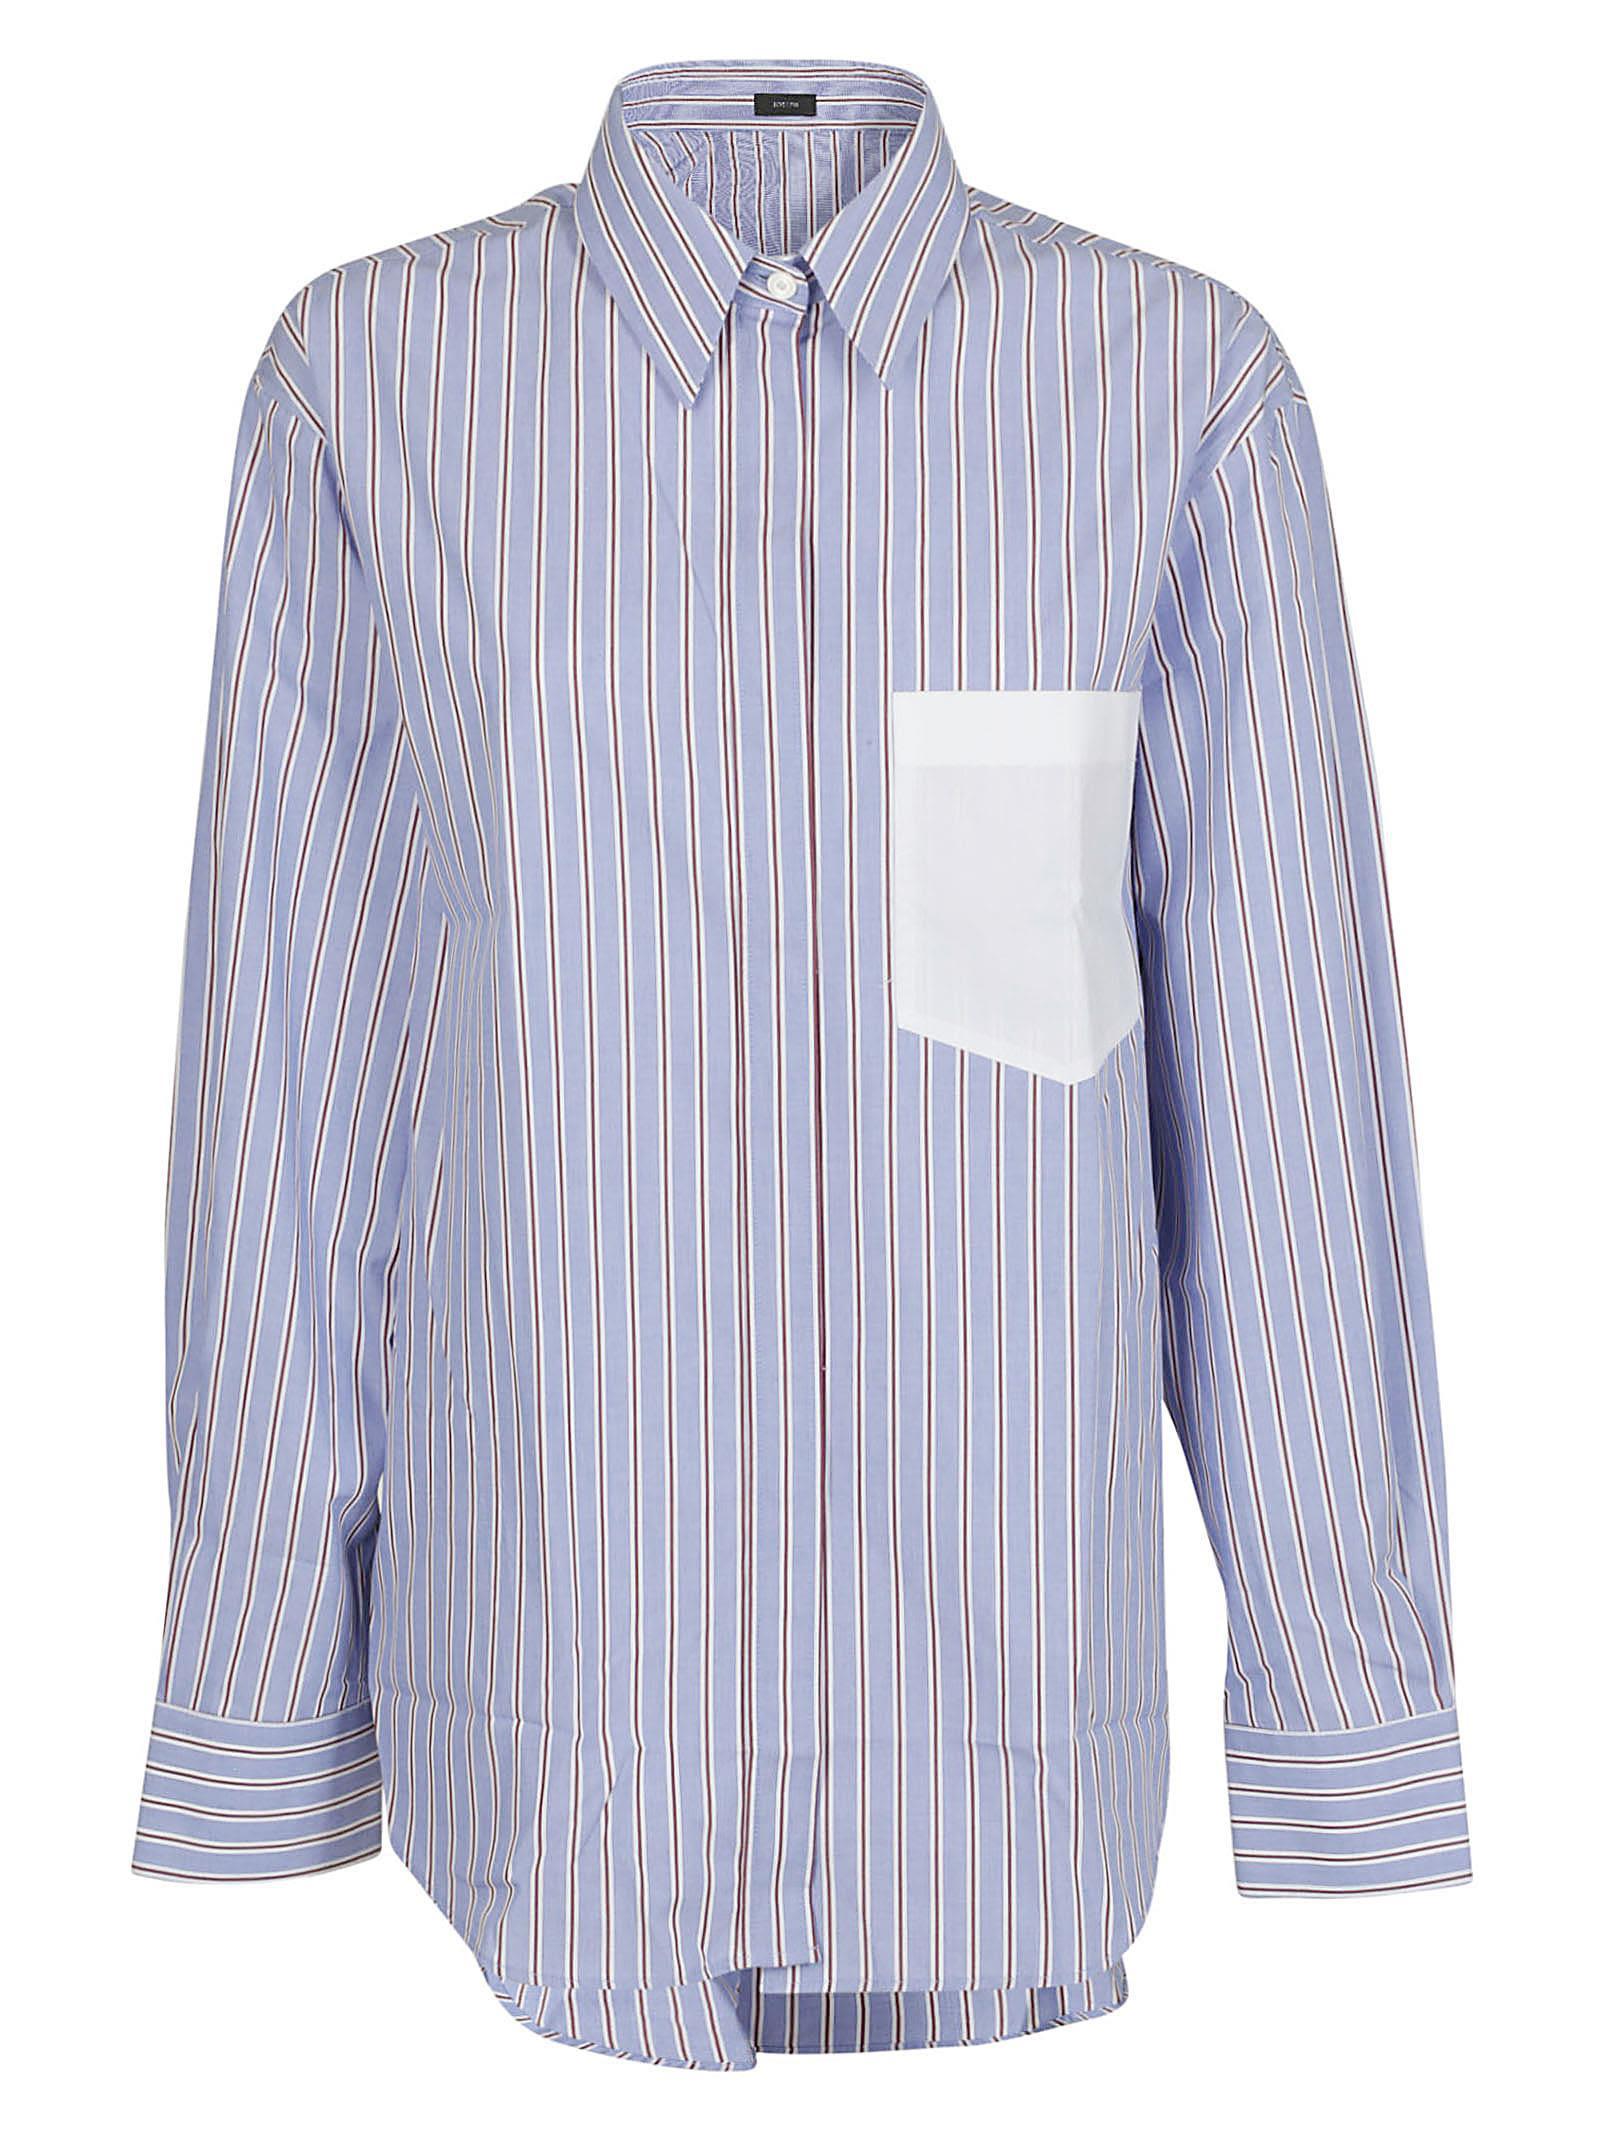 Joseph Shirt In Blu/Rosso